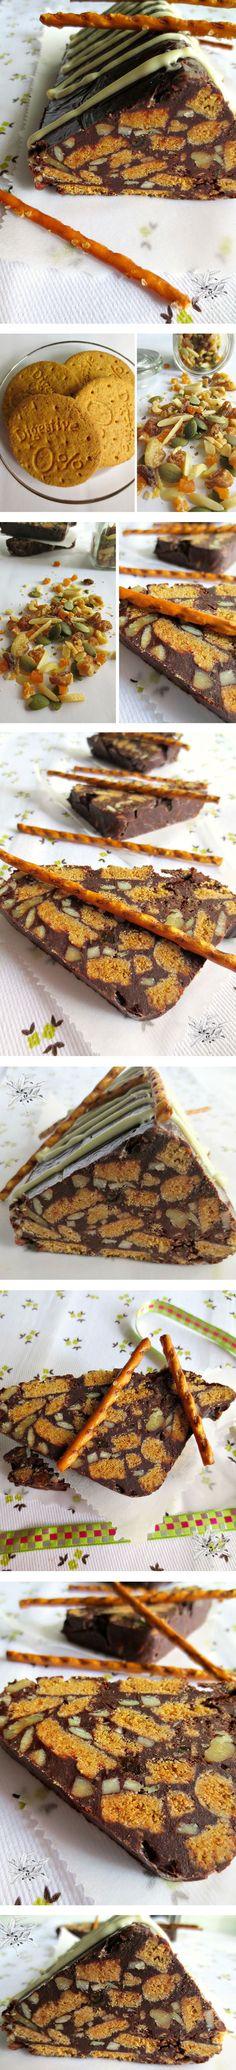 tarta-galletas-frutos-secos-chocolate-pecados-reposteria